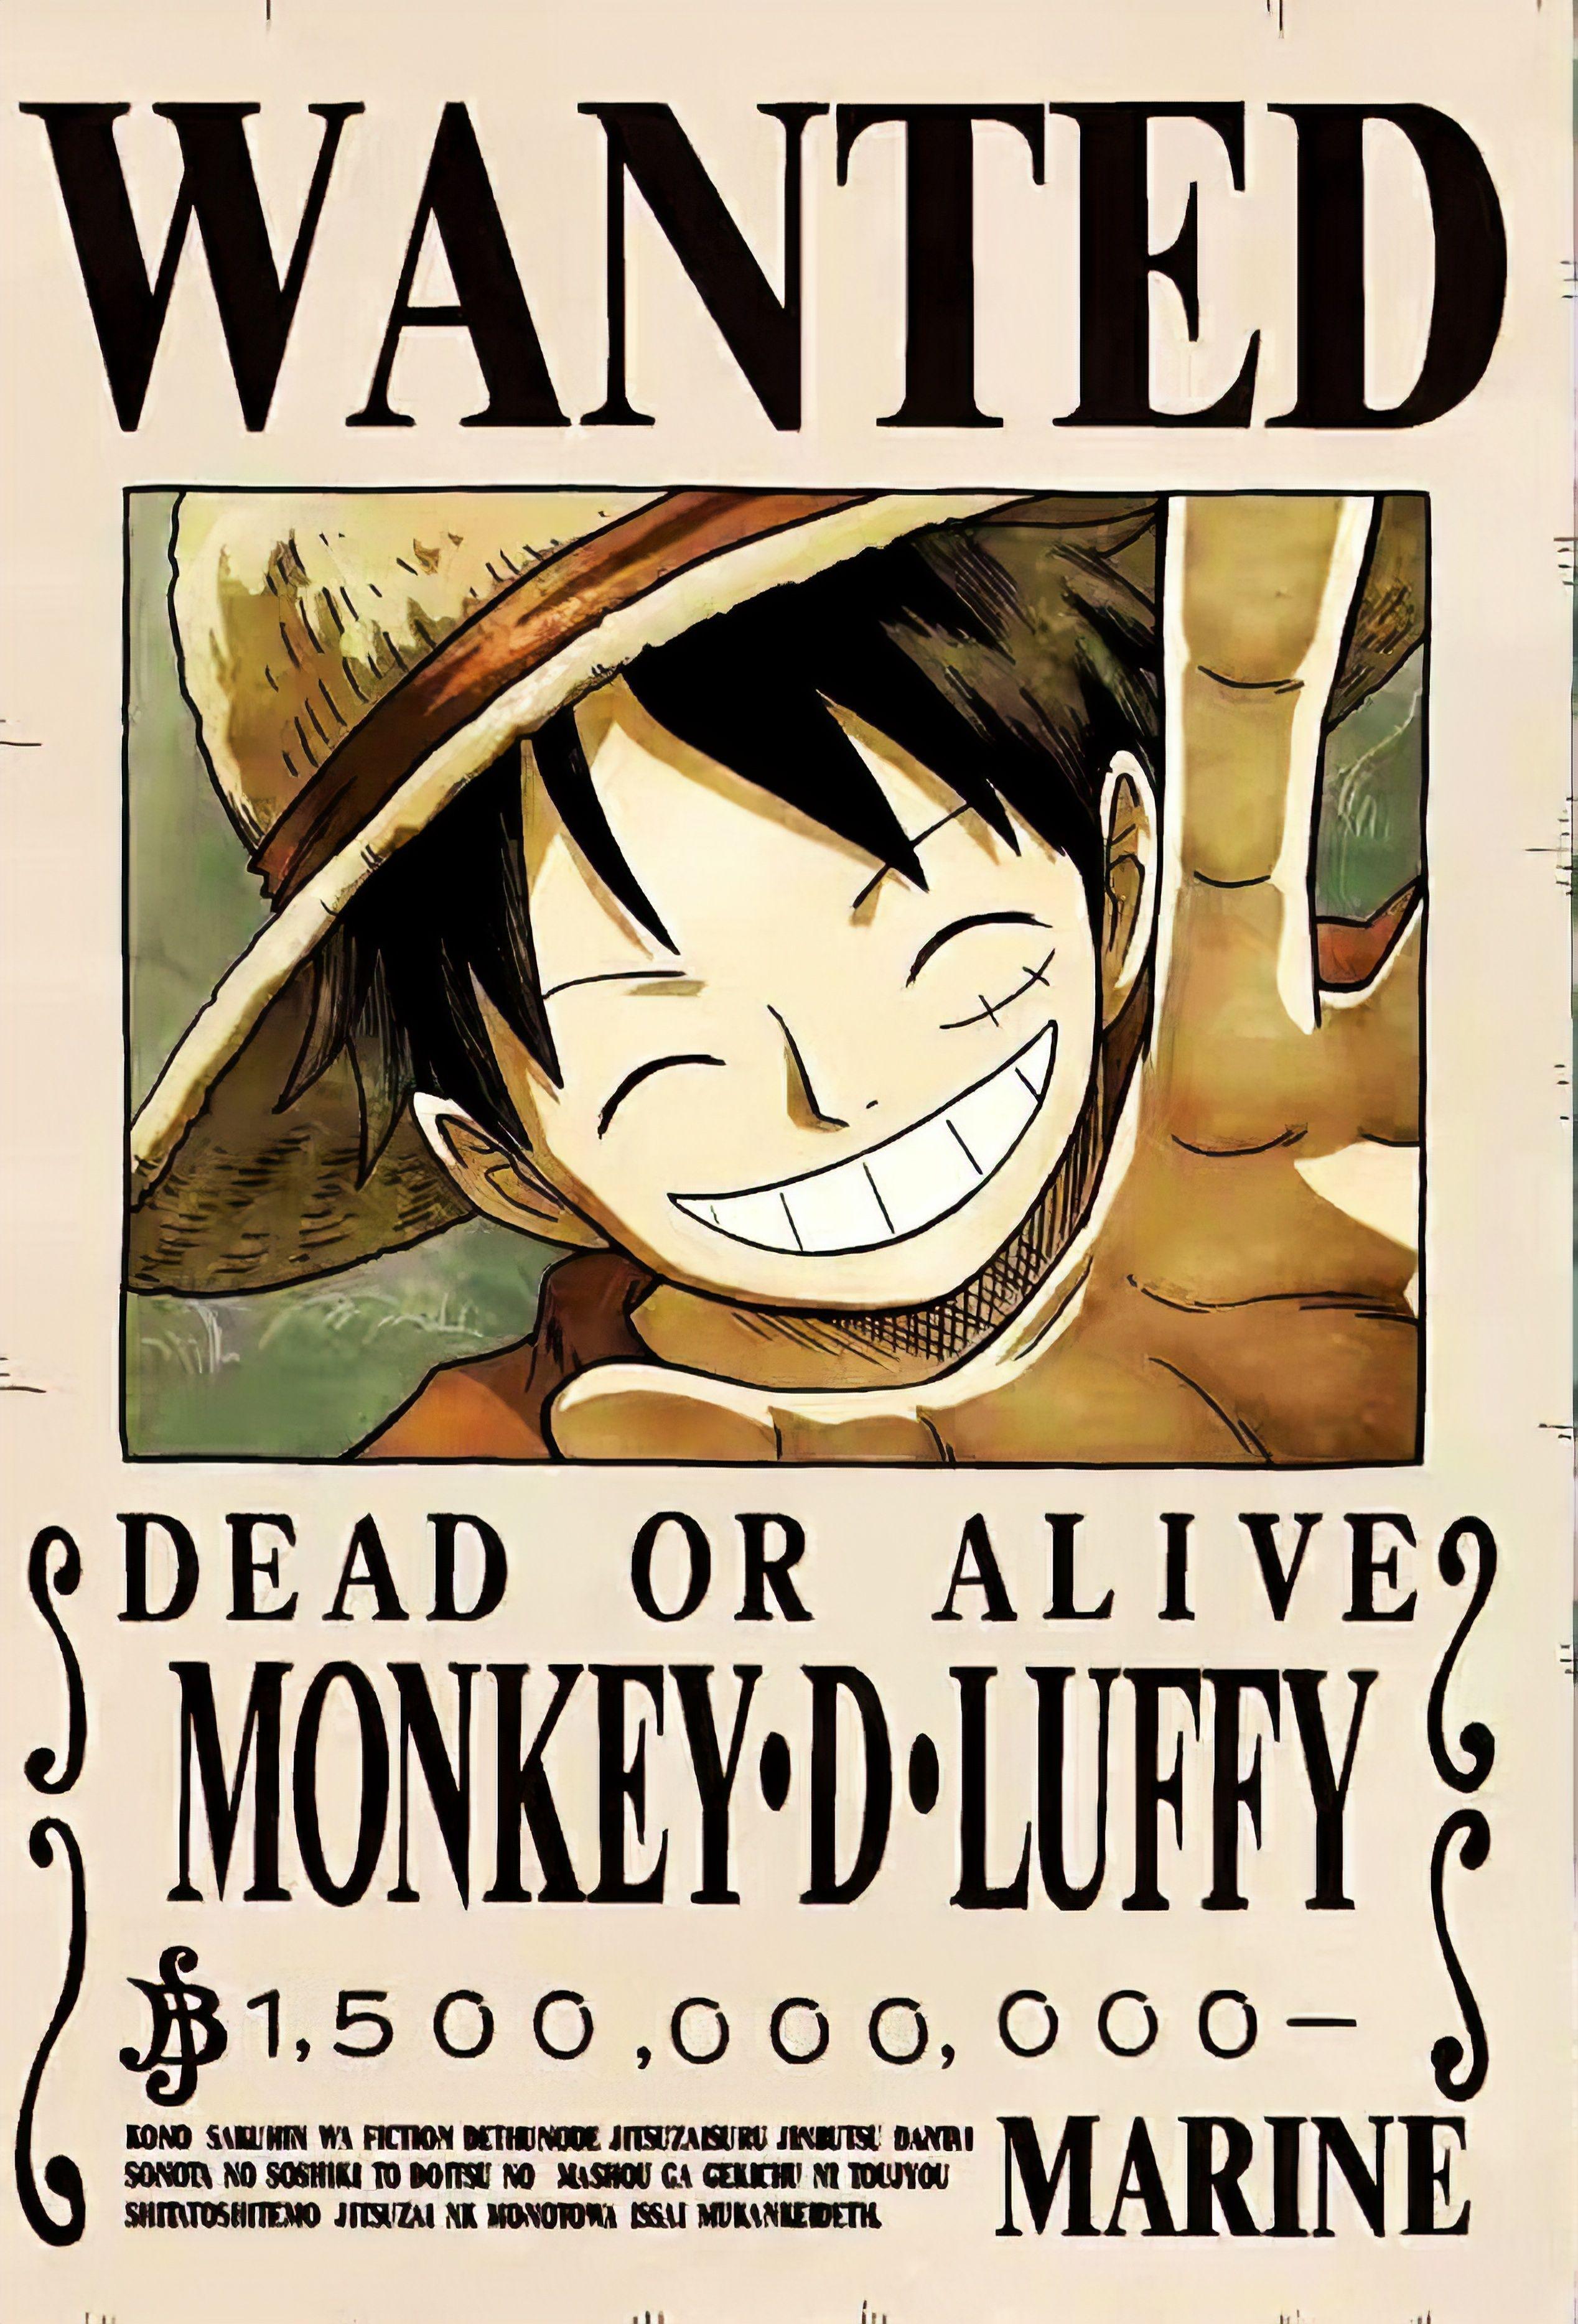 Luffy 1 5 Billion Bounty Poster 4k Bajak Laut Topi Jerami Ilustrasi Karakter